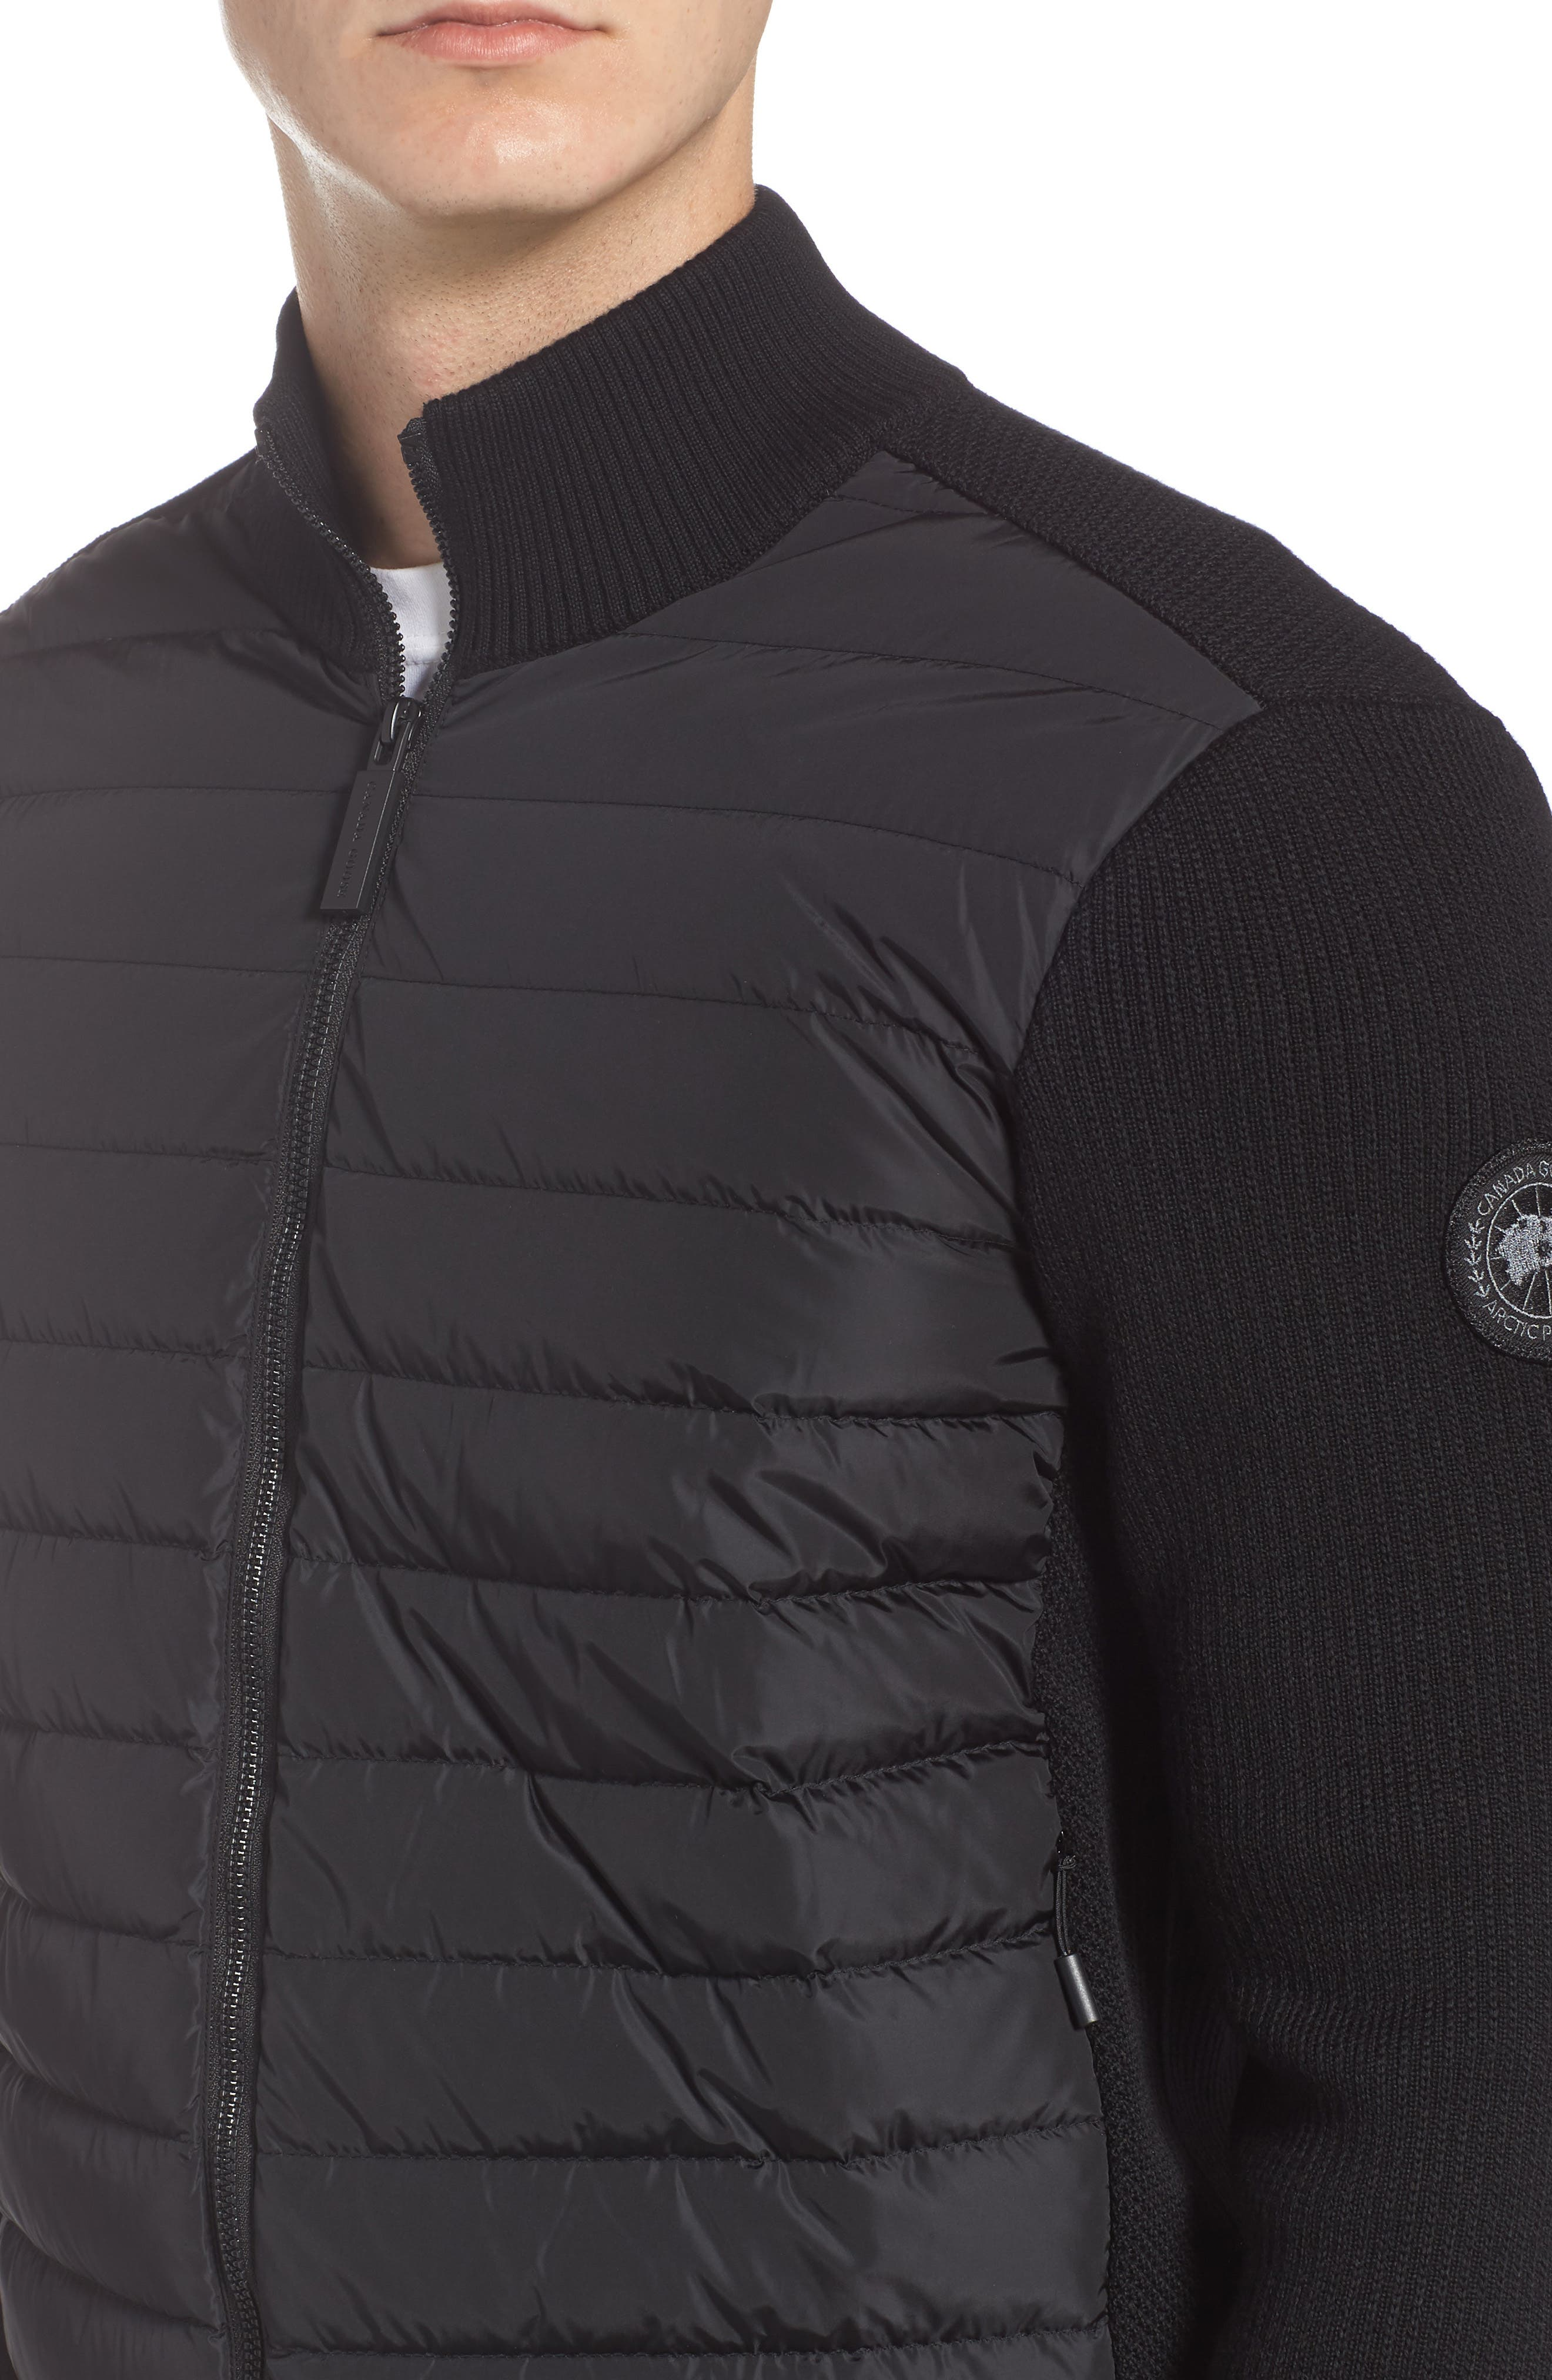 Hybridge Slim Fit Down Front Knit Jacket,                             Alternate thumbnail 4, color,                             BLACK